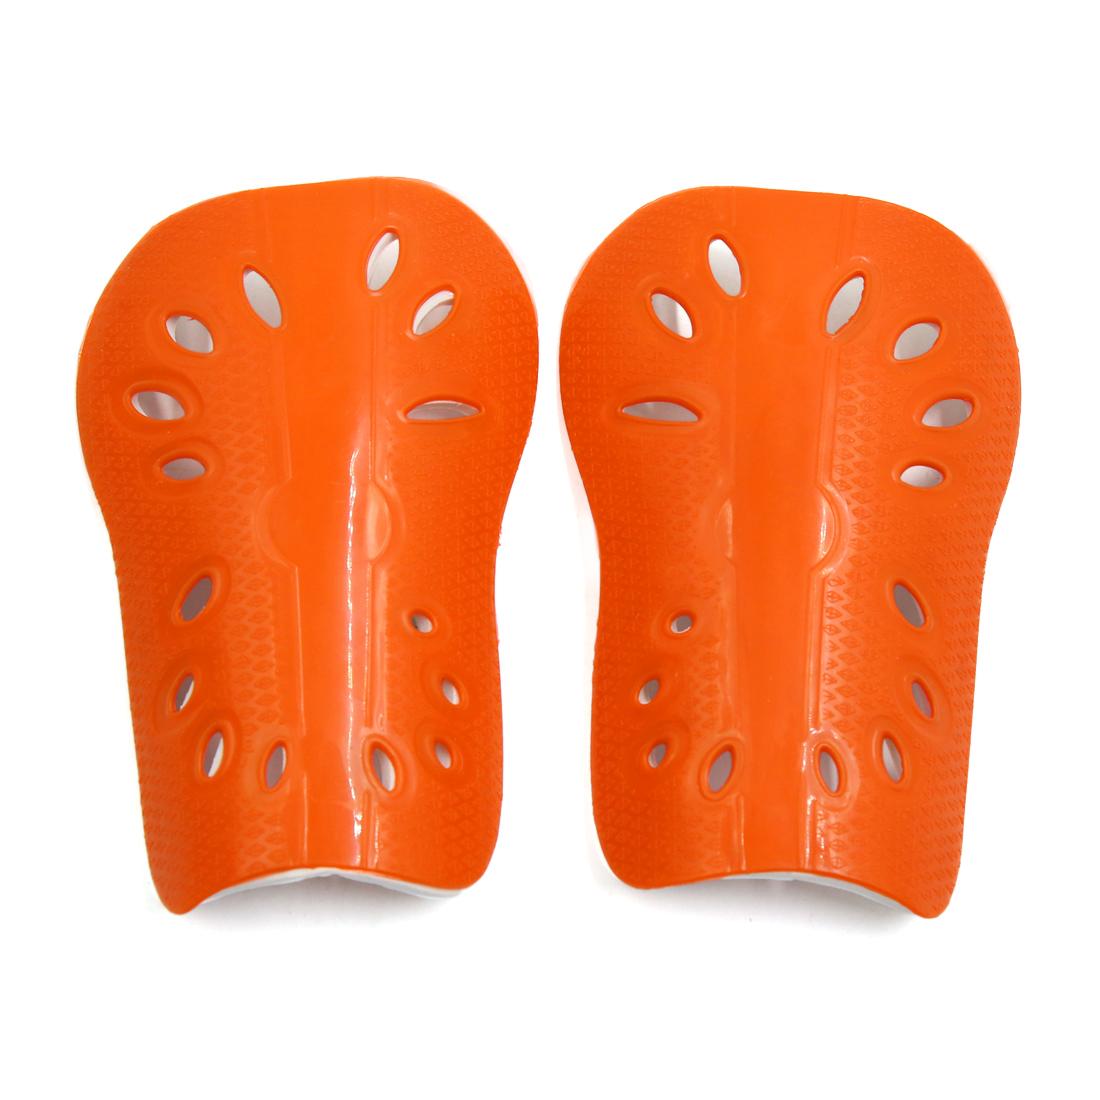 1 Pair Fluorescent Orange Kids Football Outdoor Sports Shin Pad Protective Gear Legs Guards